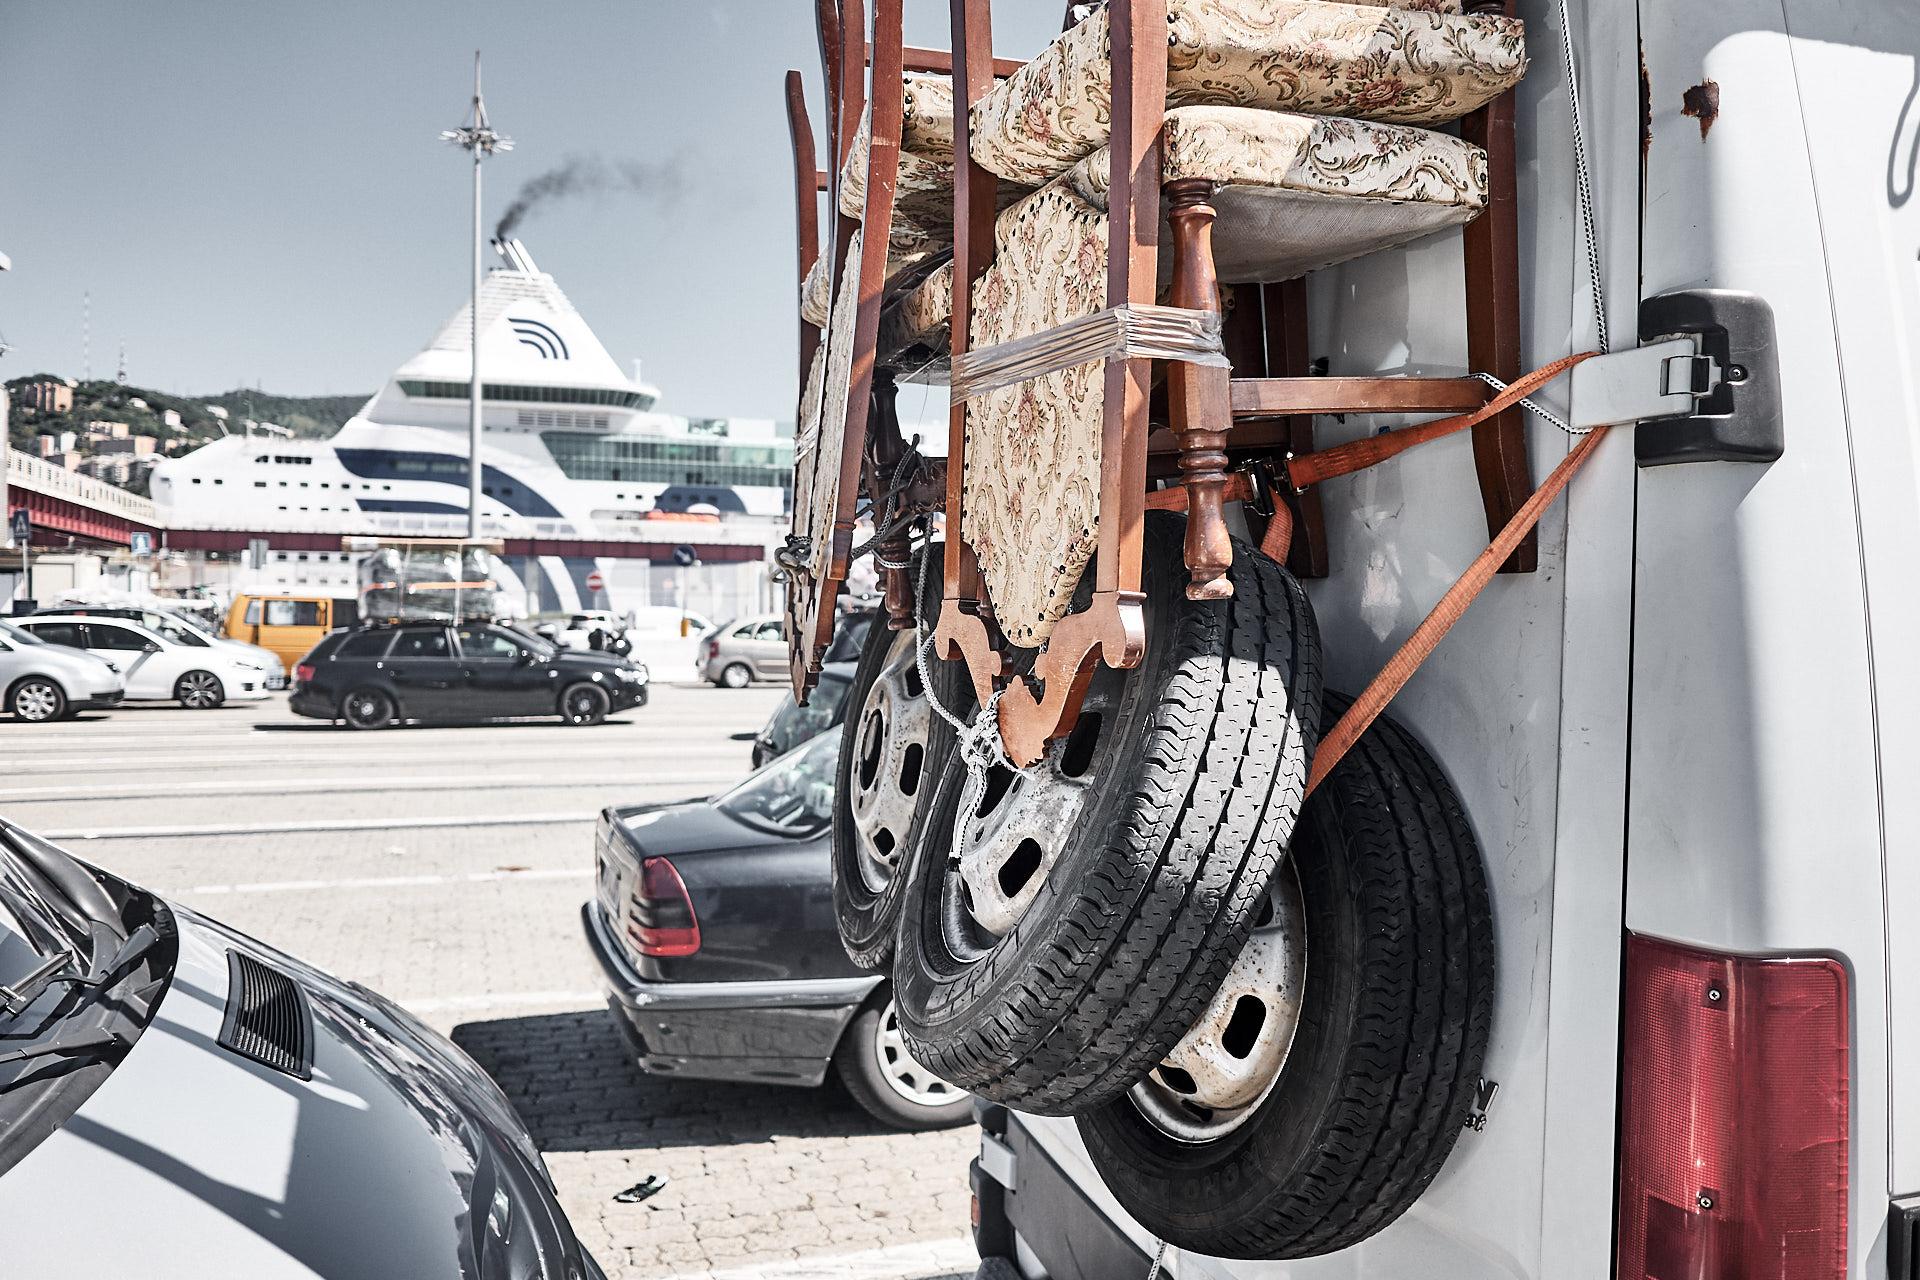 Hafen in Genua, sensationell gepackte Fahrzeuge